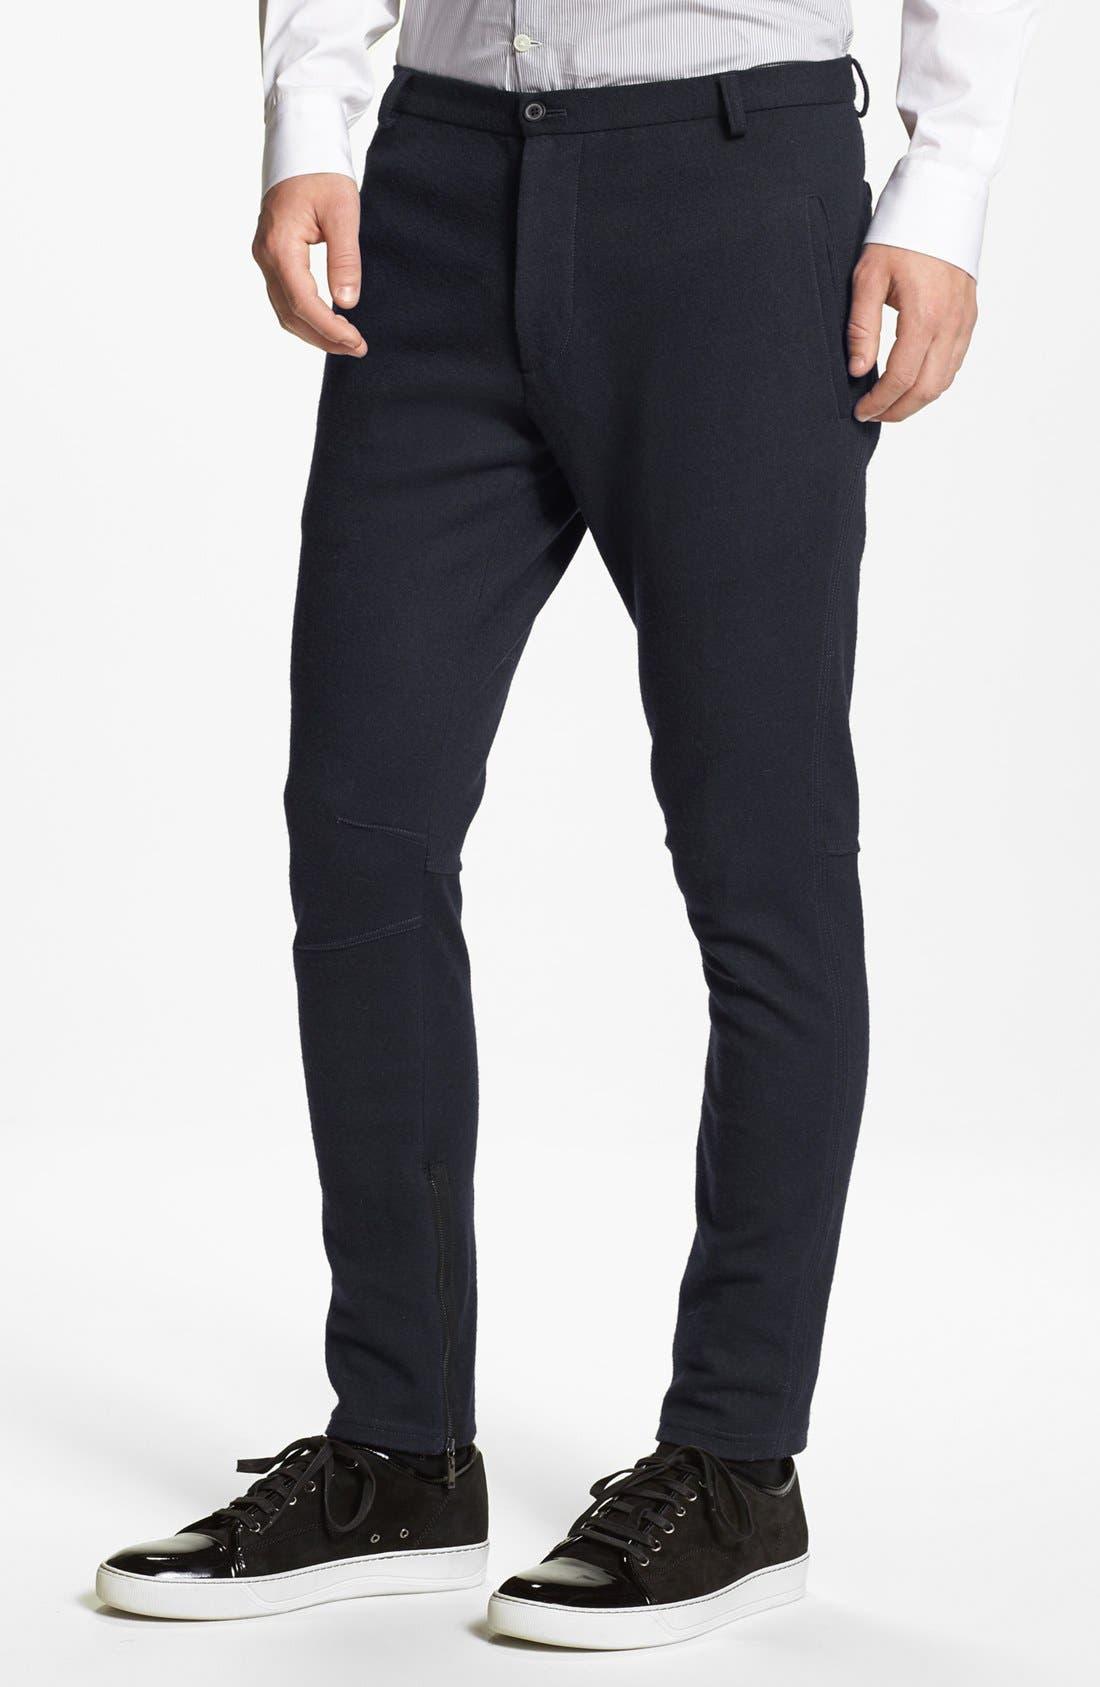 Alternate Image 1 Selected - Lanvin Slim Fit Stretch Pants